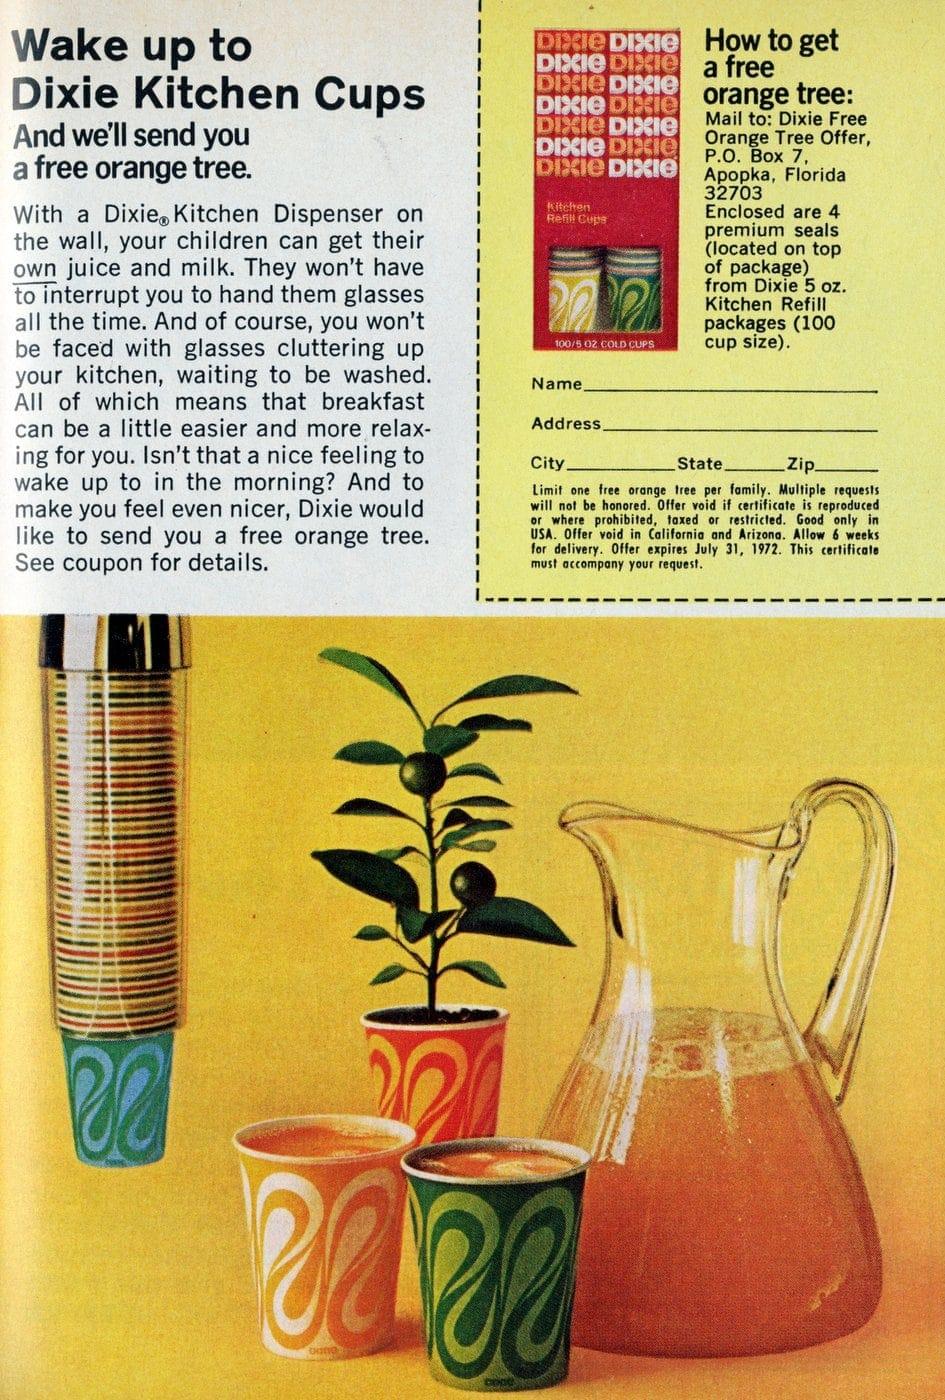 Retro swirl pattern Dixie cups (1972)